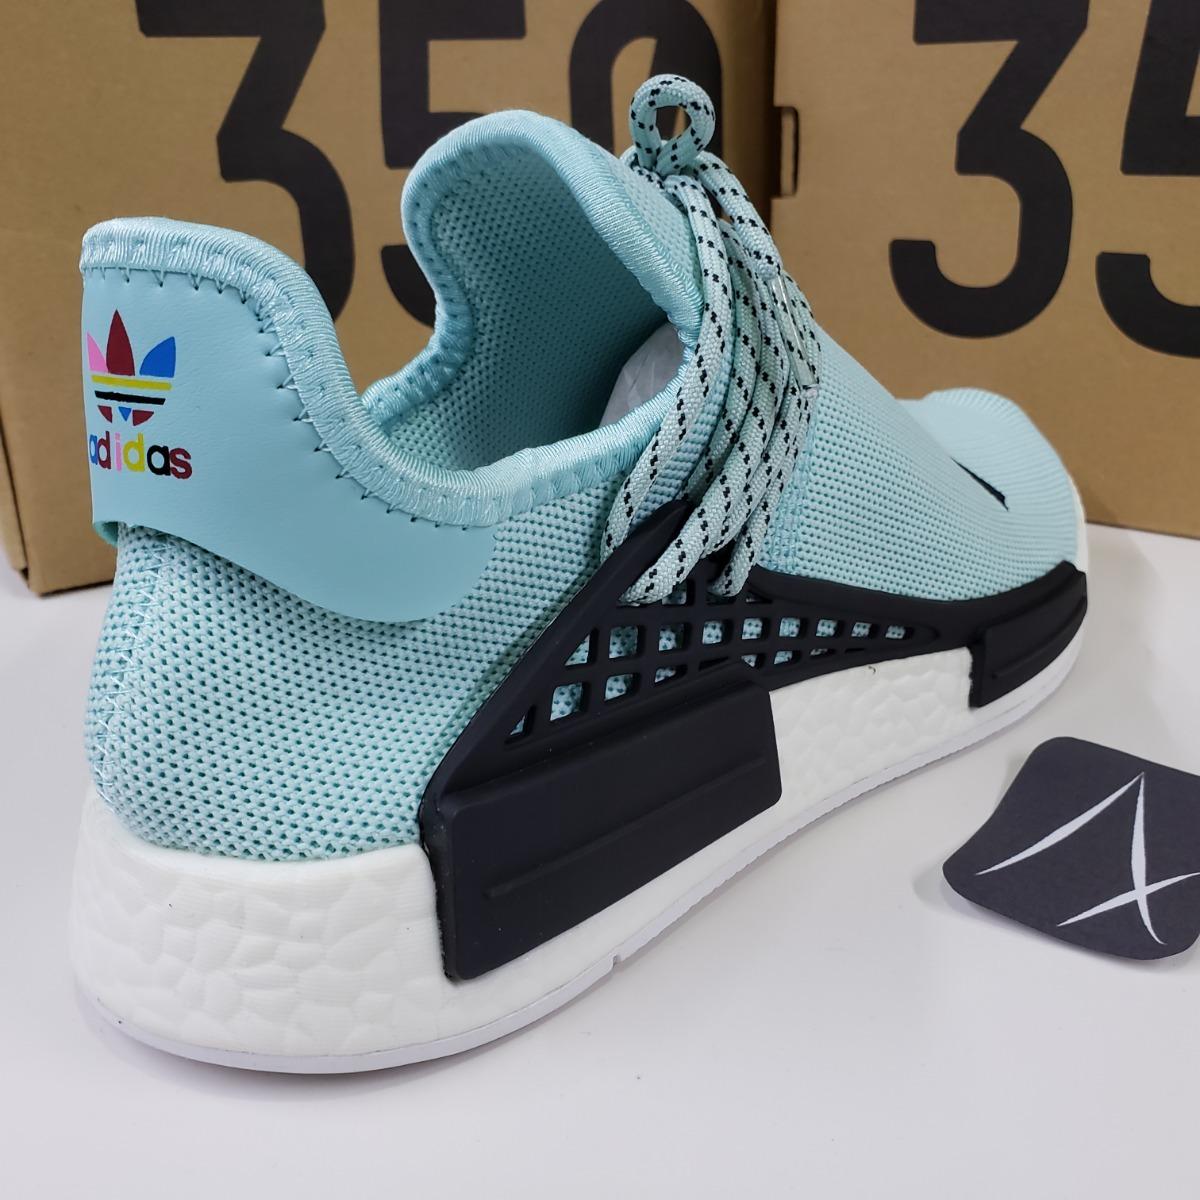 buy popular 9669e e9b51 adidas Nmd Human Race Blue Azules Agua Boost Pharrell